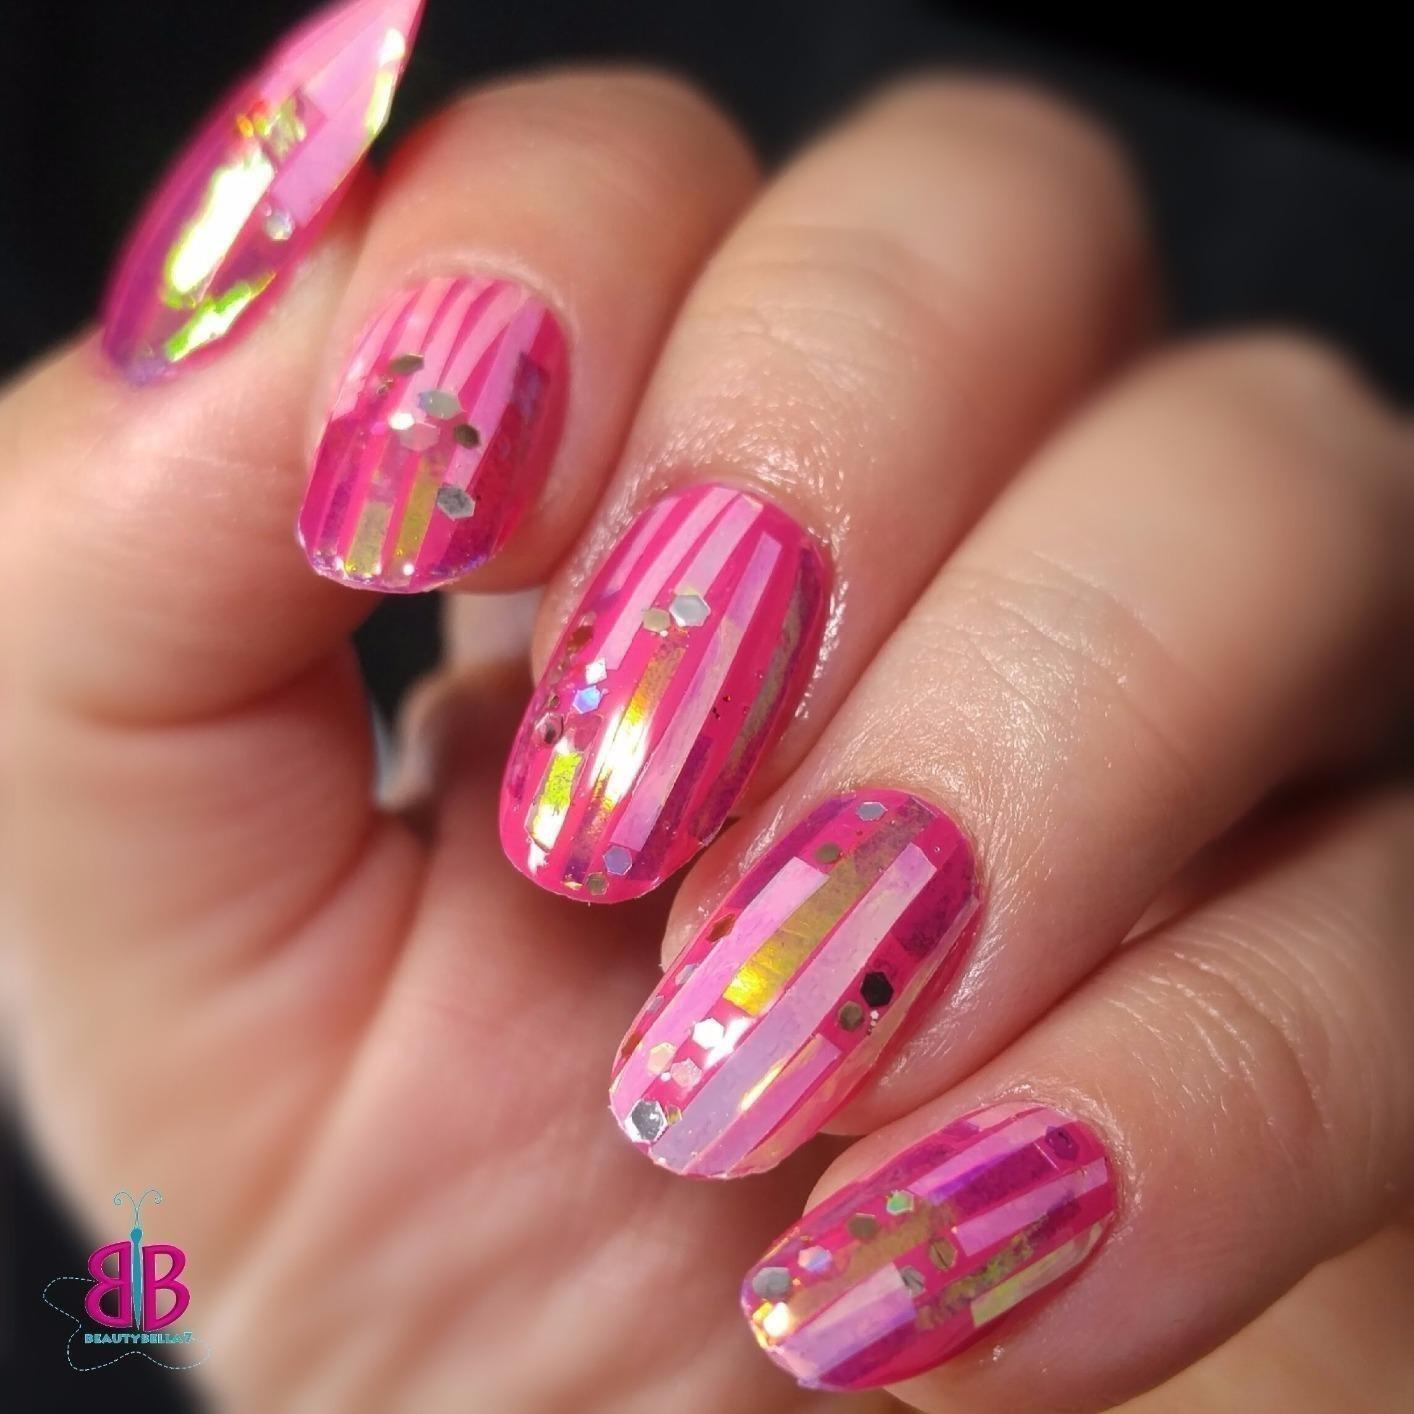 BTArtbox Fake Nails Short Oval Nails Round Nails Full Cover ...